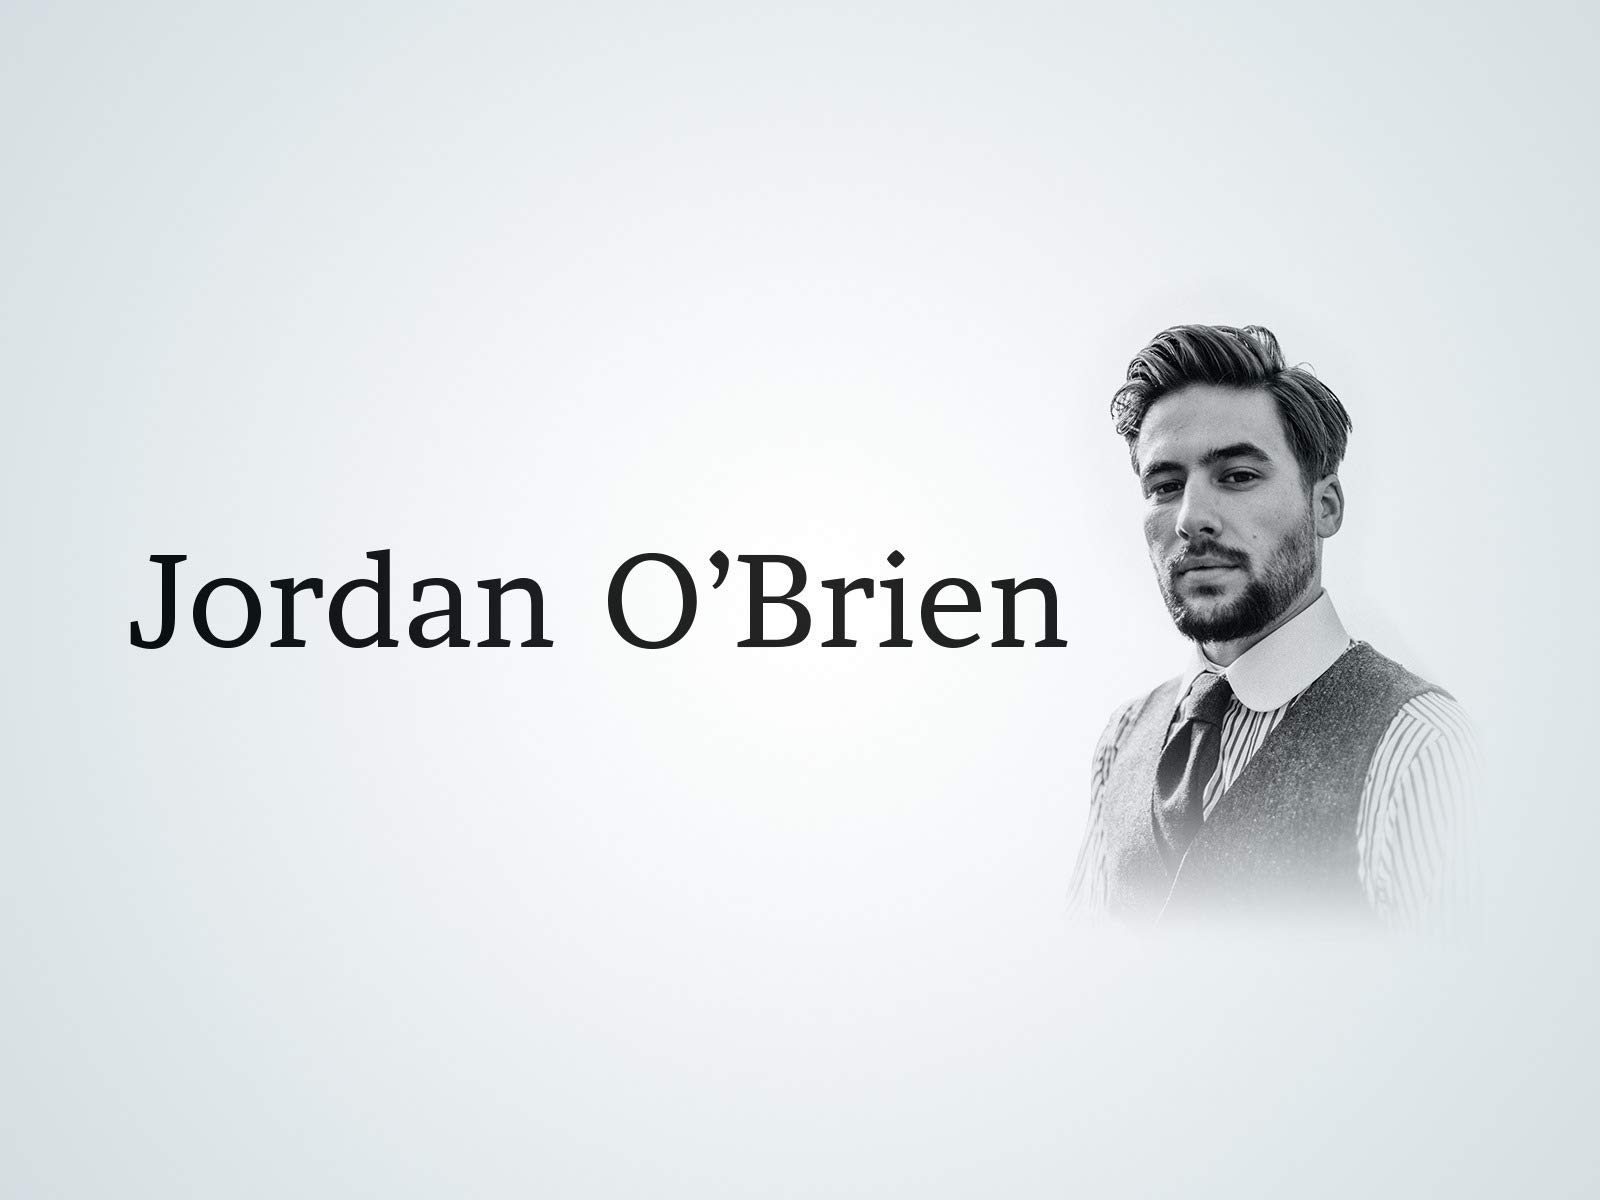 Joran O' Brien